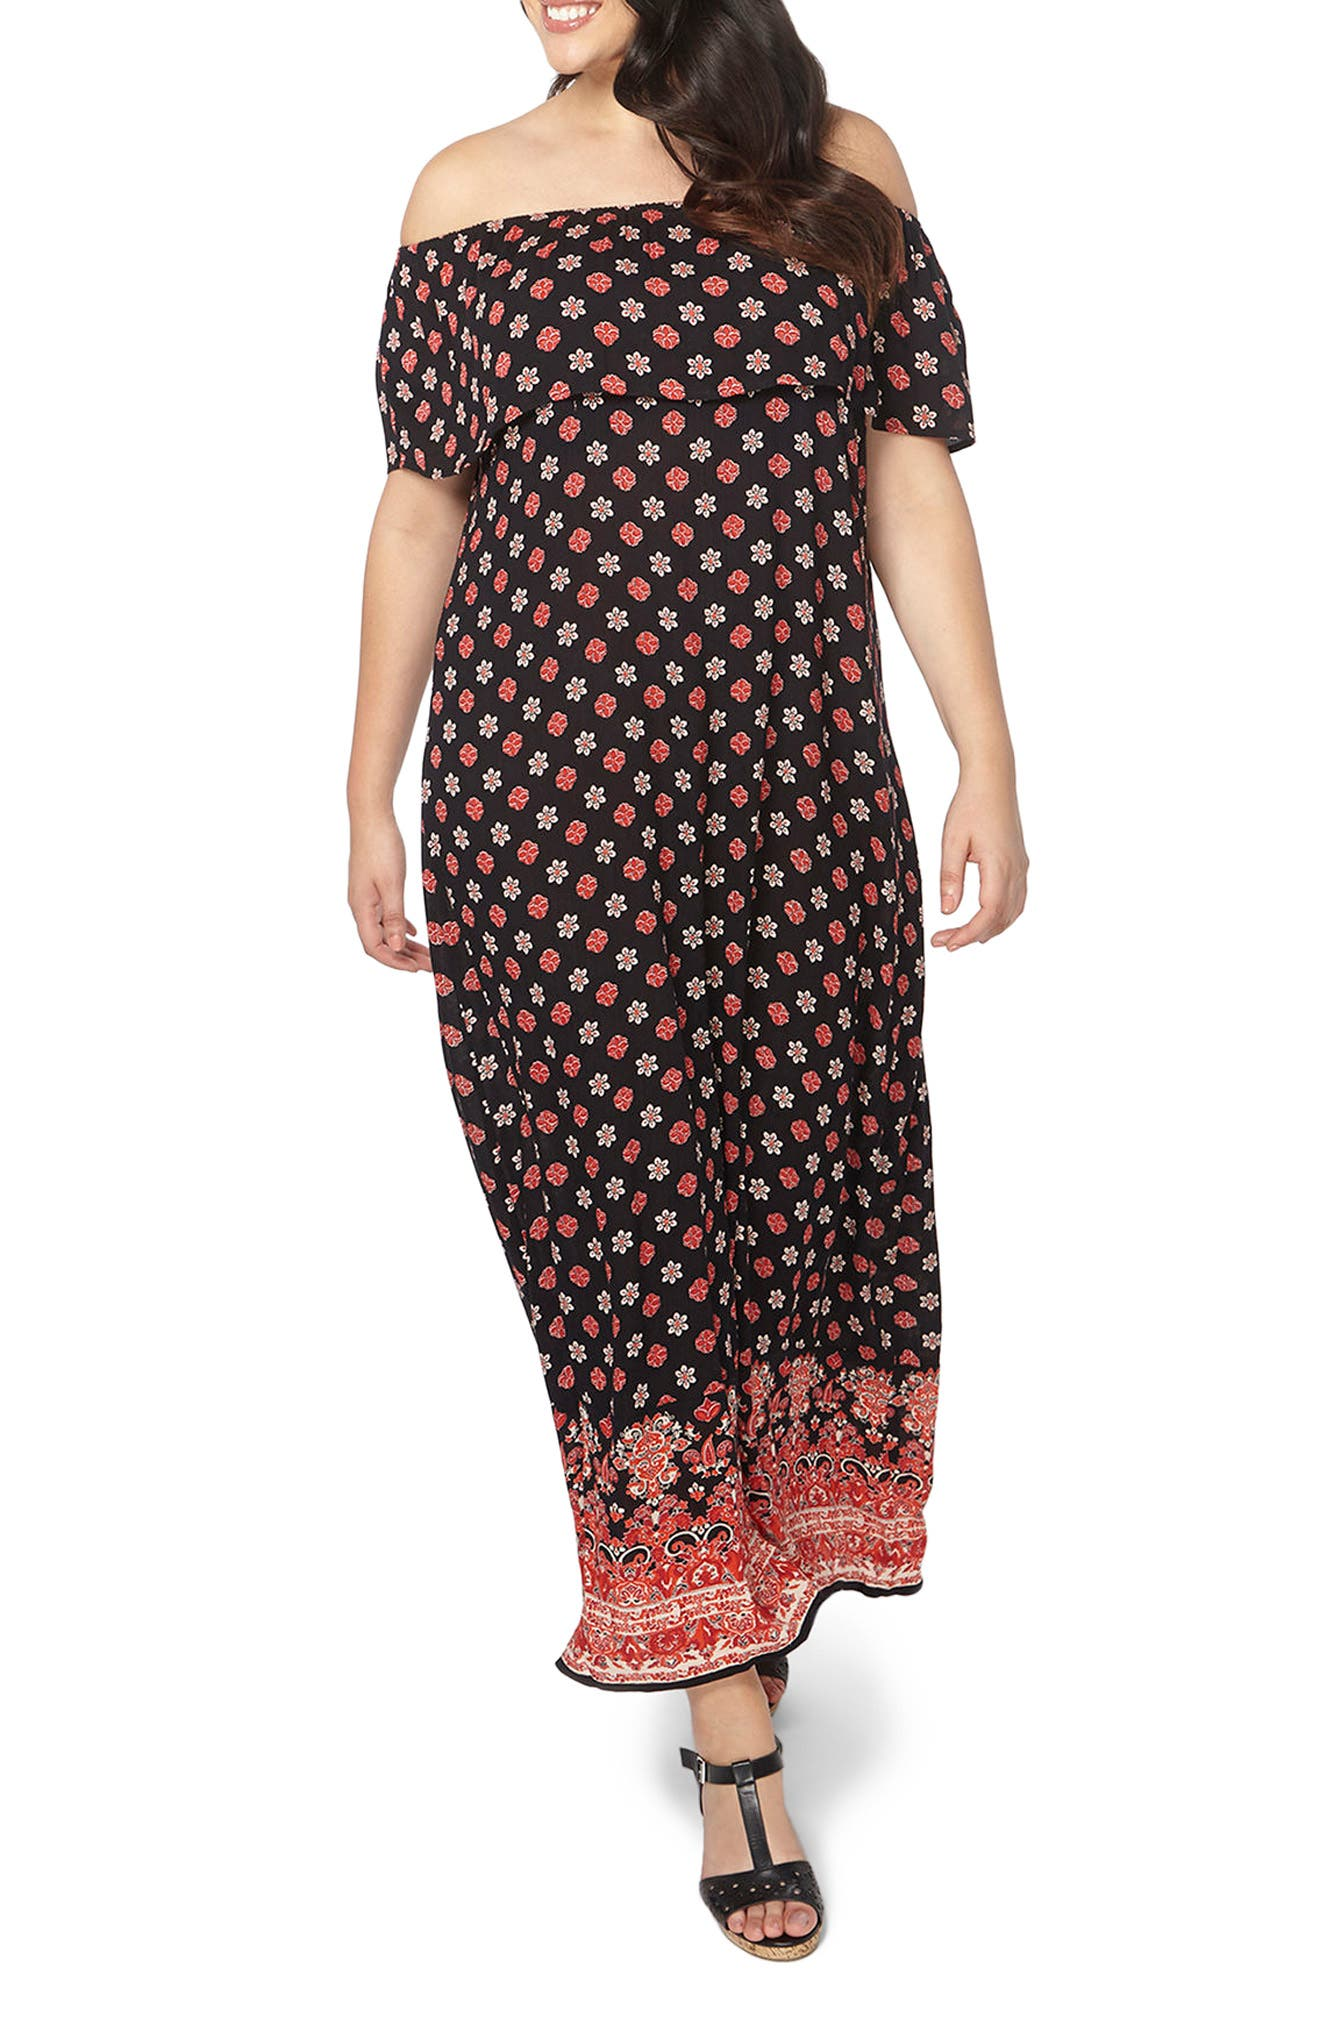 Alternate Image 1 Selected - Evans Border Print Maxi Dress (Plus Size)